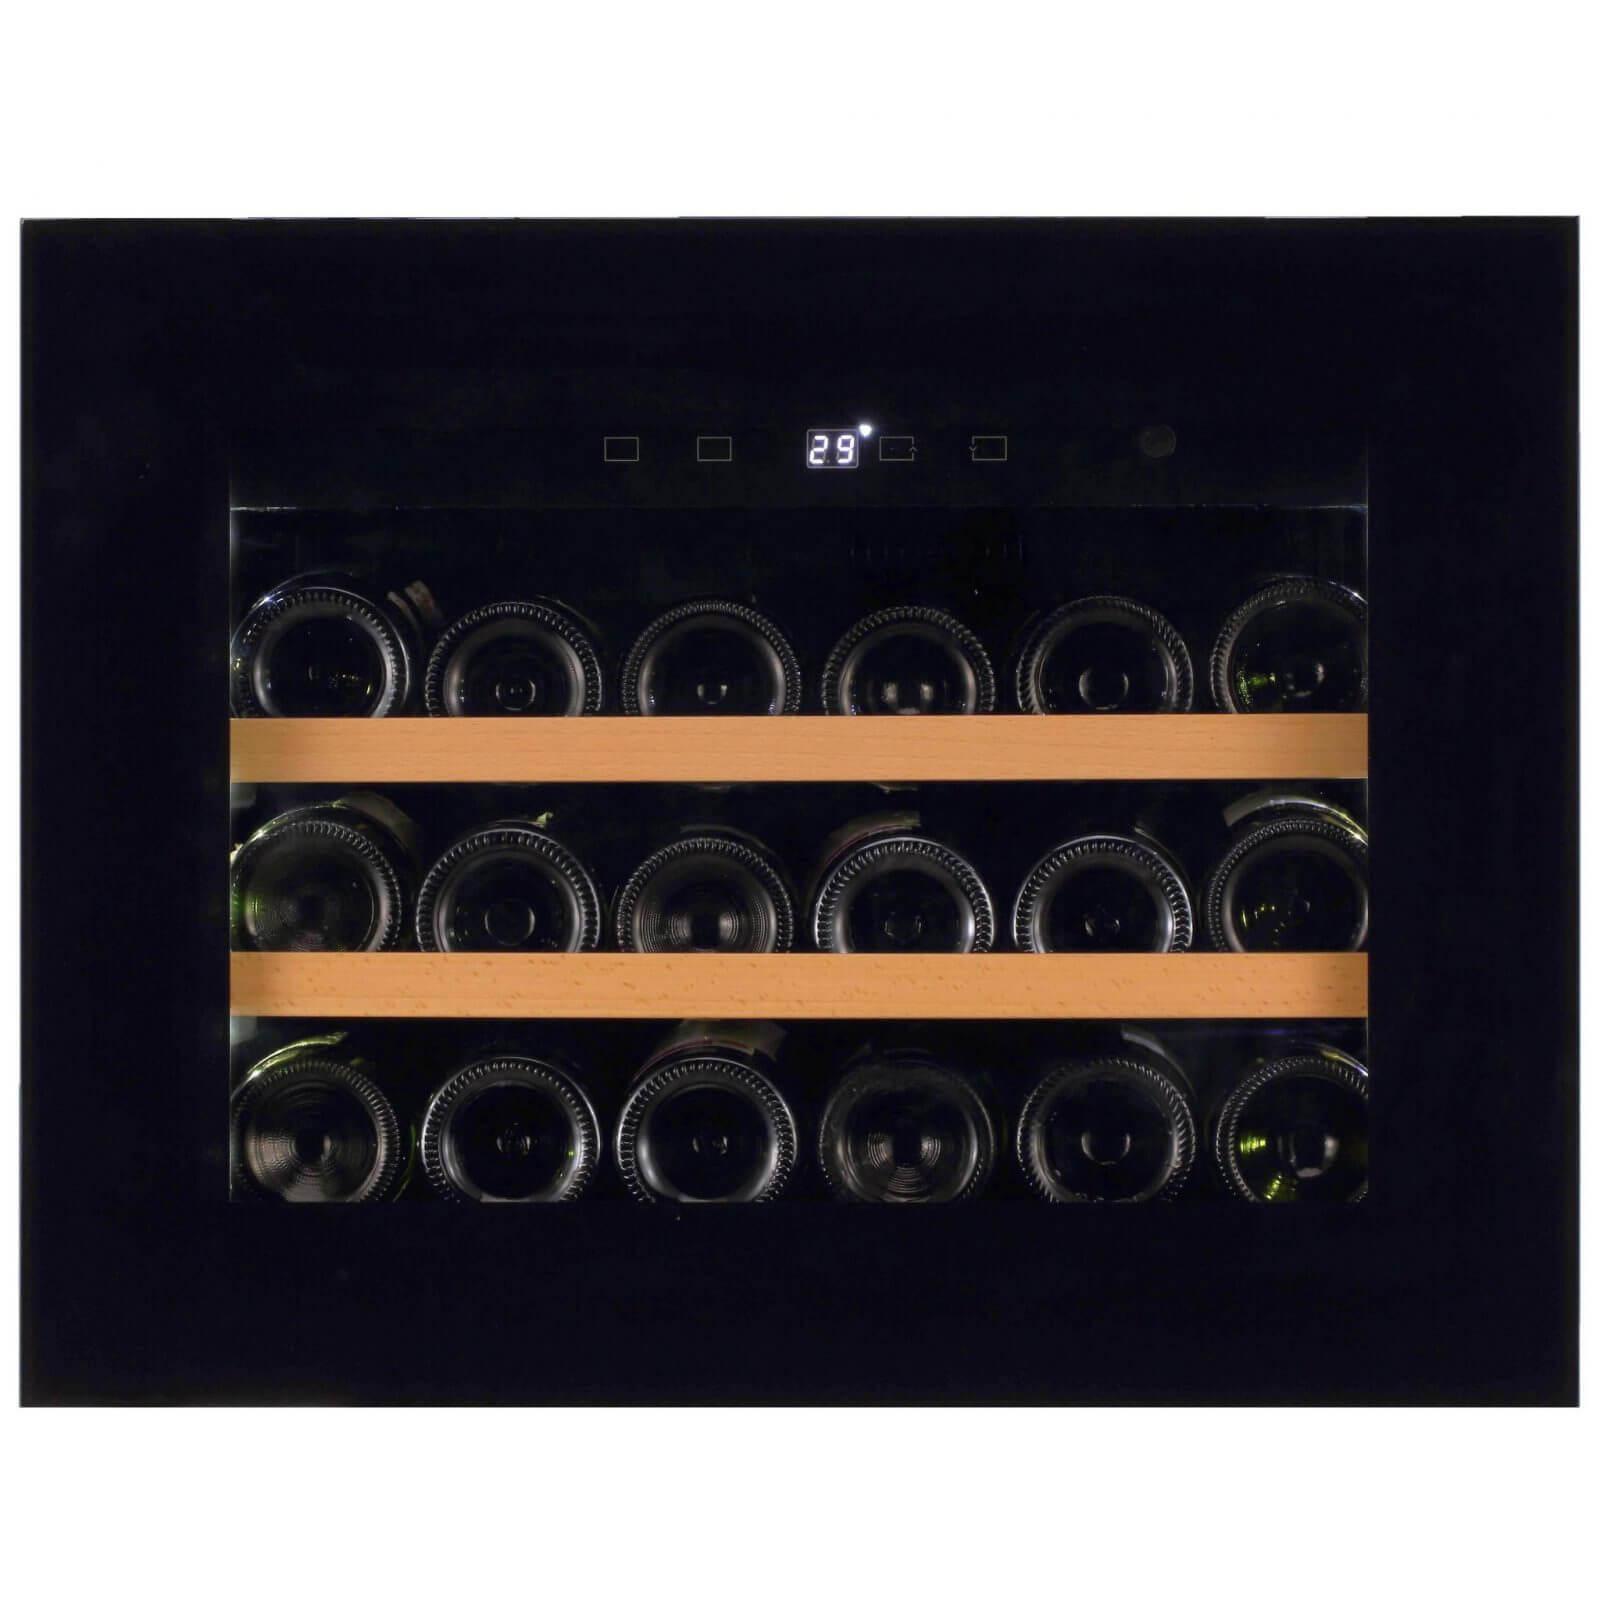 Dunavox vinska vitrina DAVG-18.46B.TO - Inelektronik